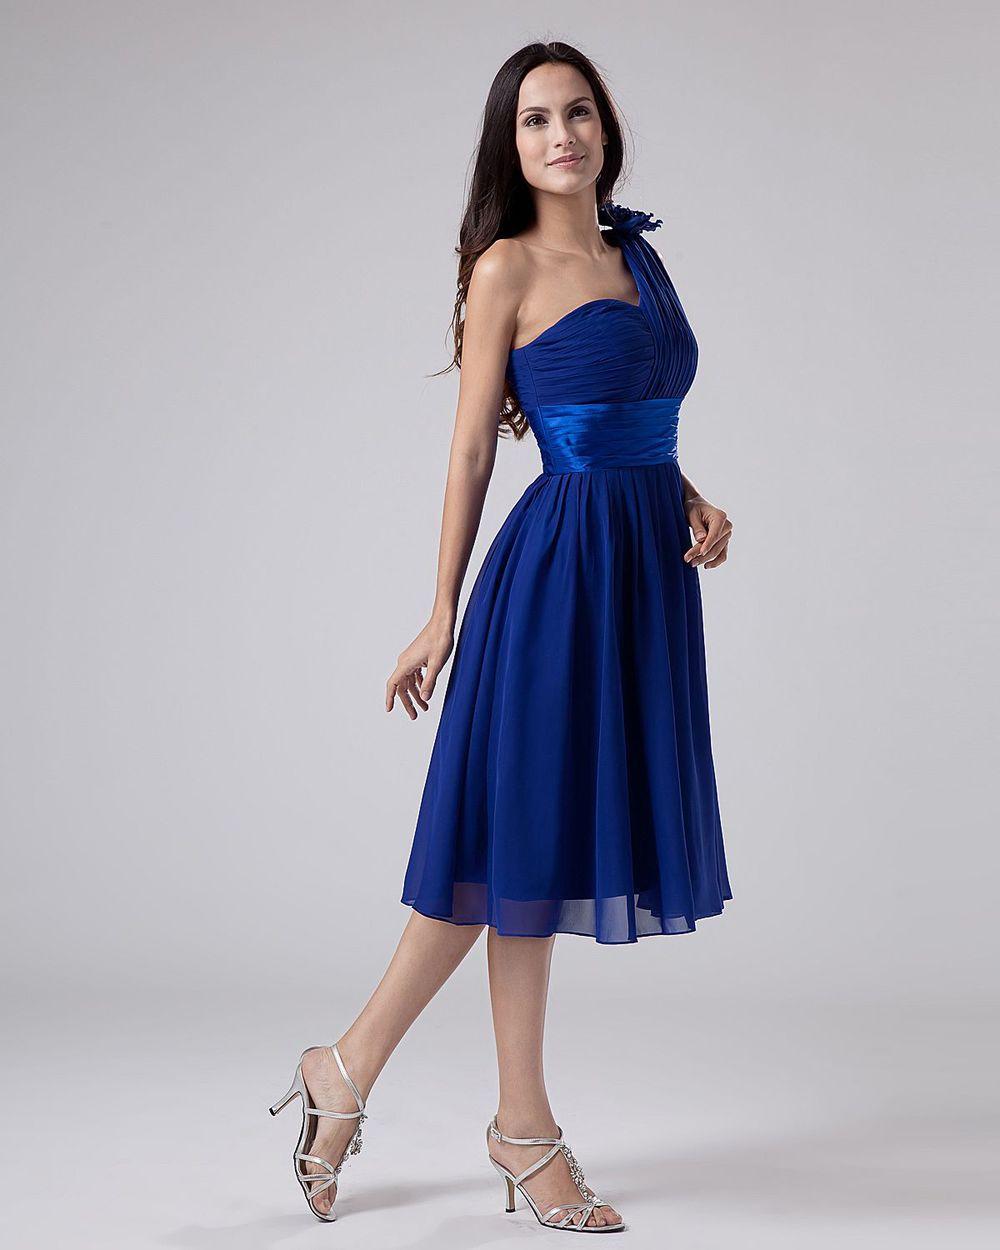 -Royal-Blue-Chiffon-One-Shoulder-Sash-Knee-Length-Bridesmaid-Dresses    One Shoulder Royal Blue Bridesmaid Dresses